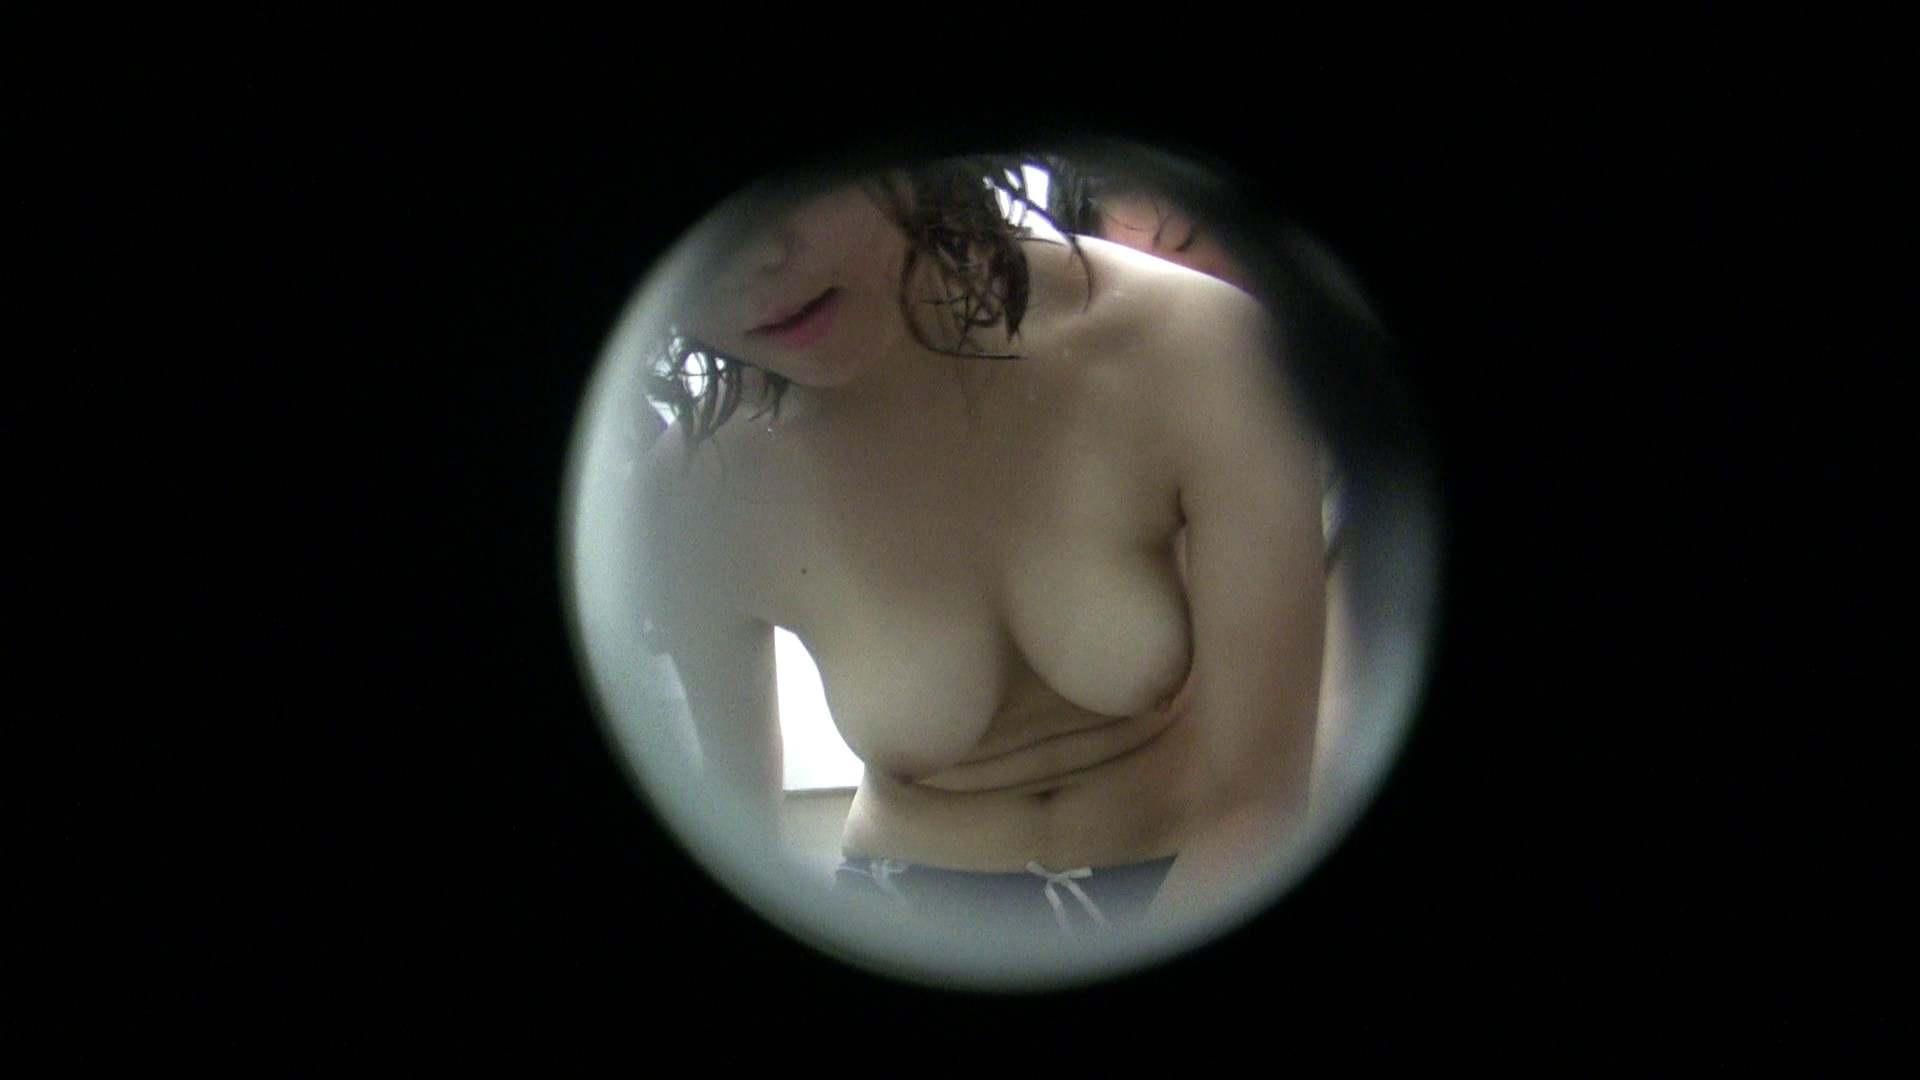 NO.23 色白巨乳嬢×2 シャワー ぱこり動画紹介 98枚 82